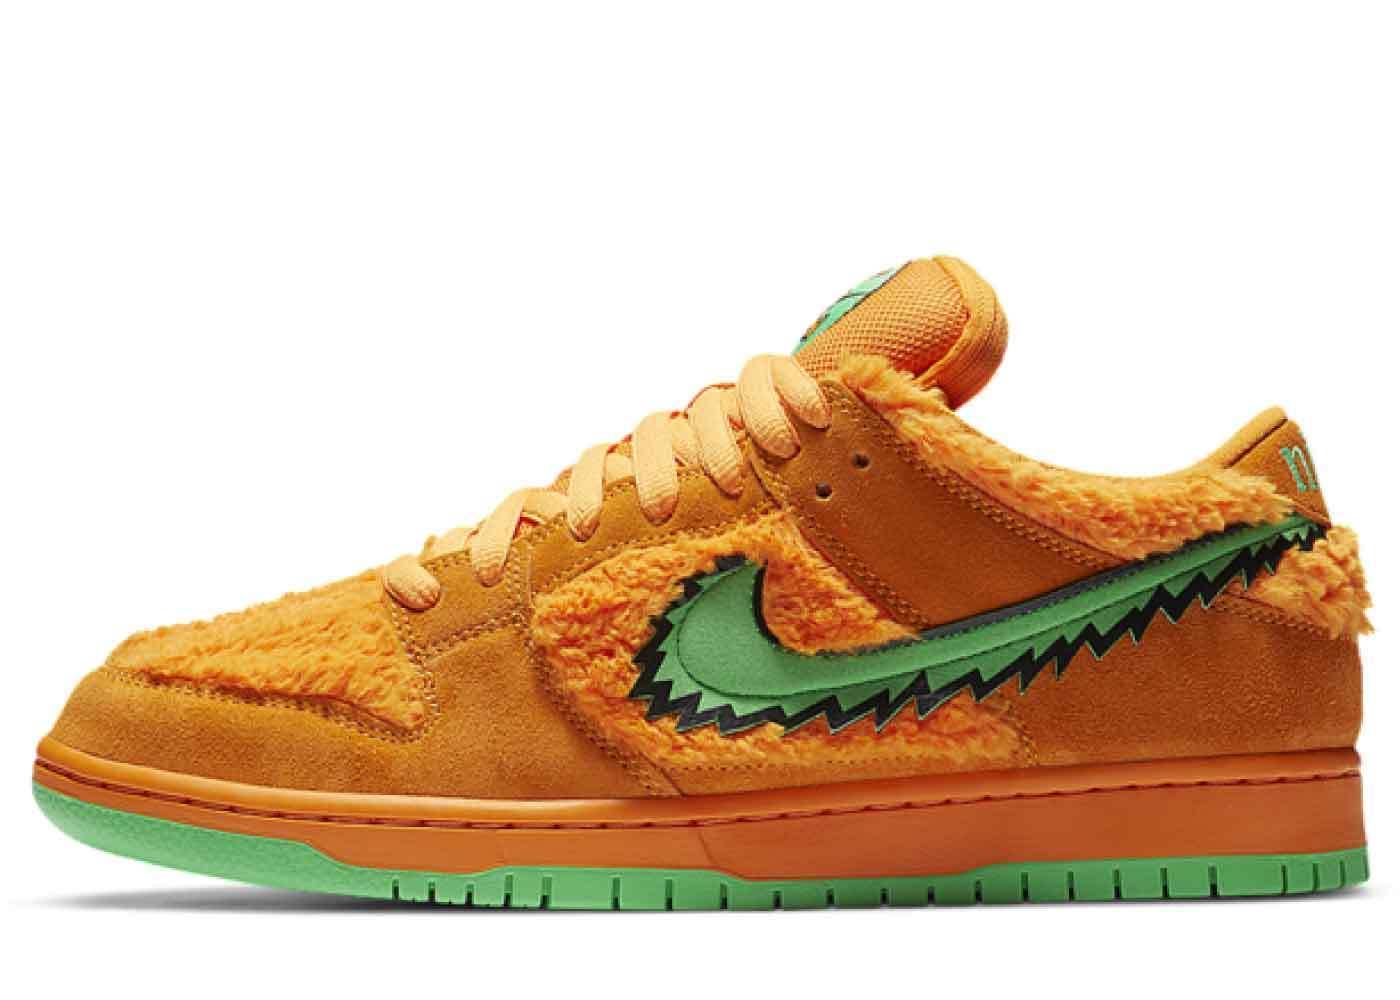 Grateful Dead x Nike SB Dunk Low Orange Bearの写真